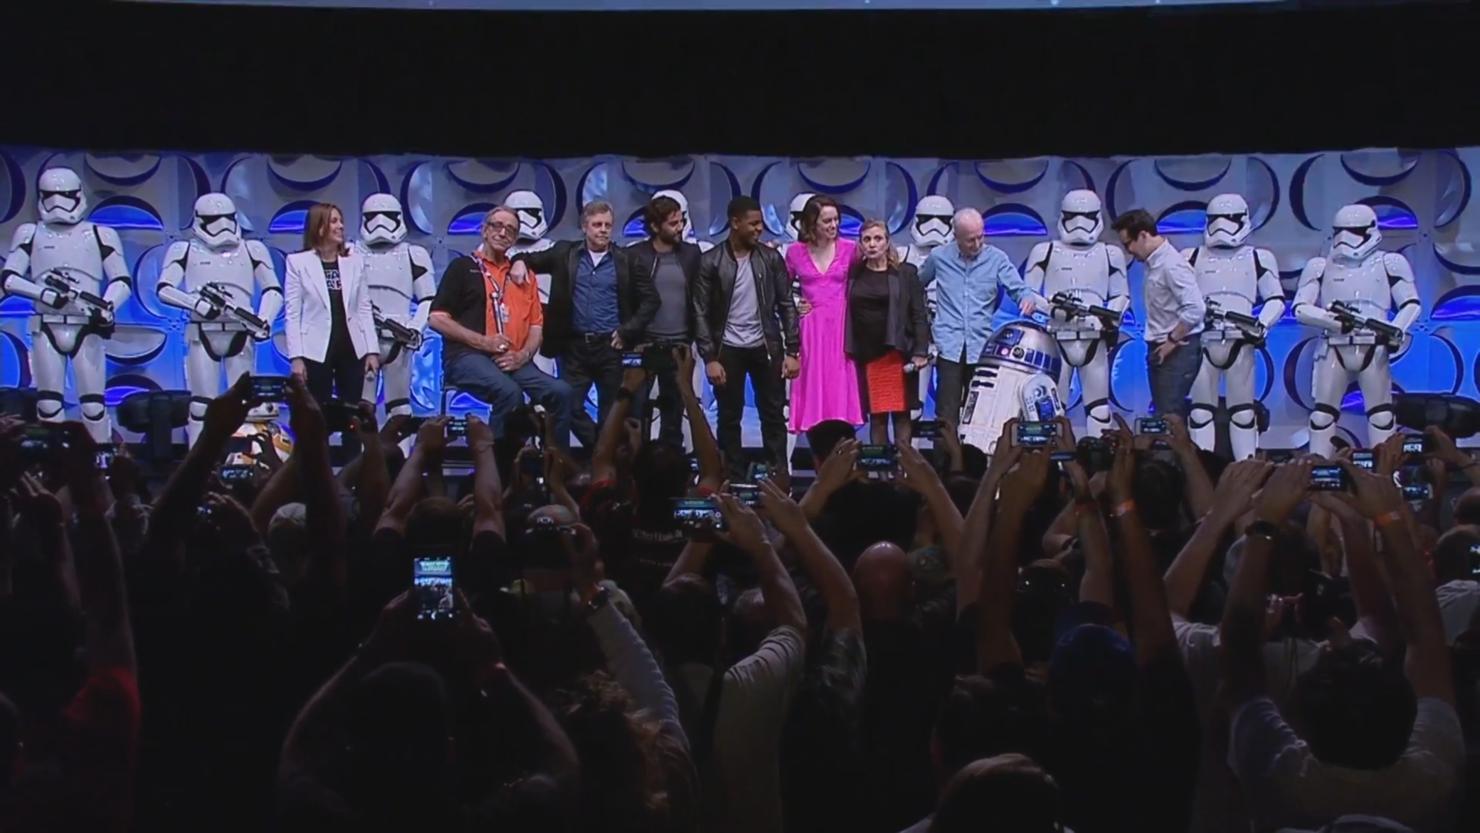 star-wars-the-force-awakens-11